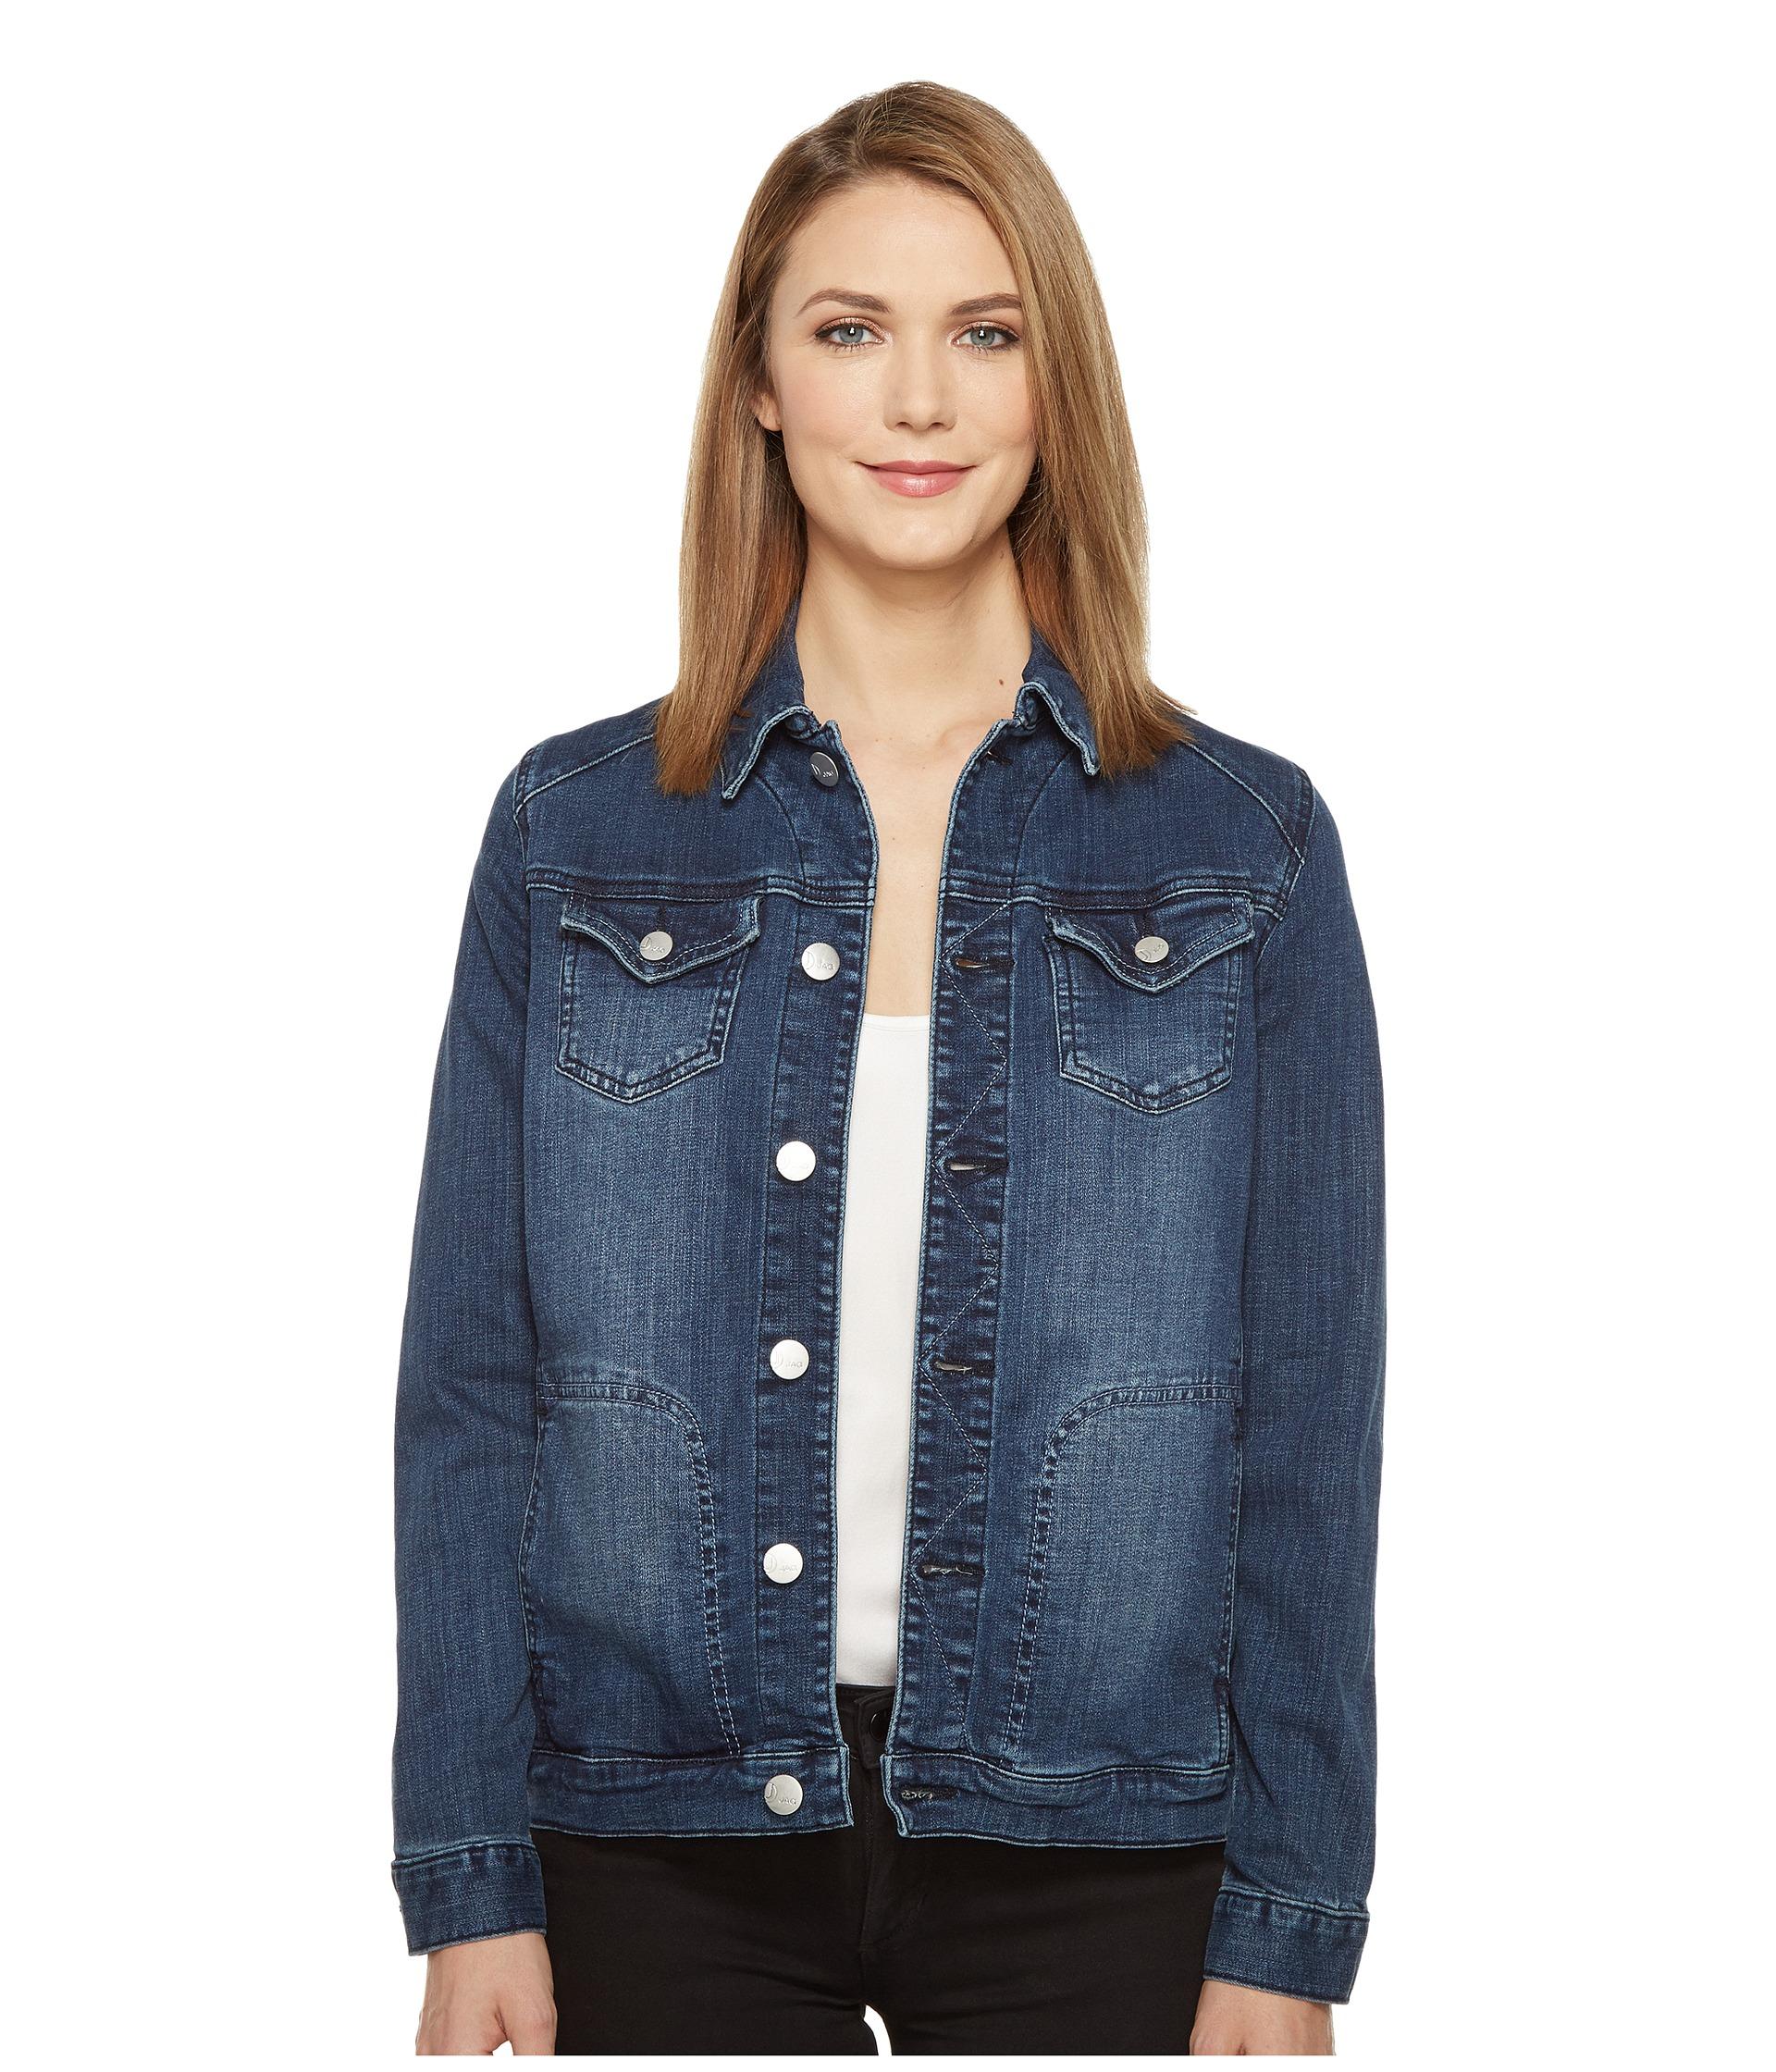 Jag Jeans Lowen Stretch Jacket in Crosshatch Denim in Thorne Blue at Zappos.com